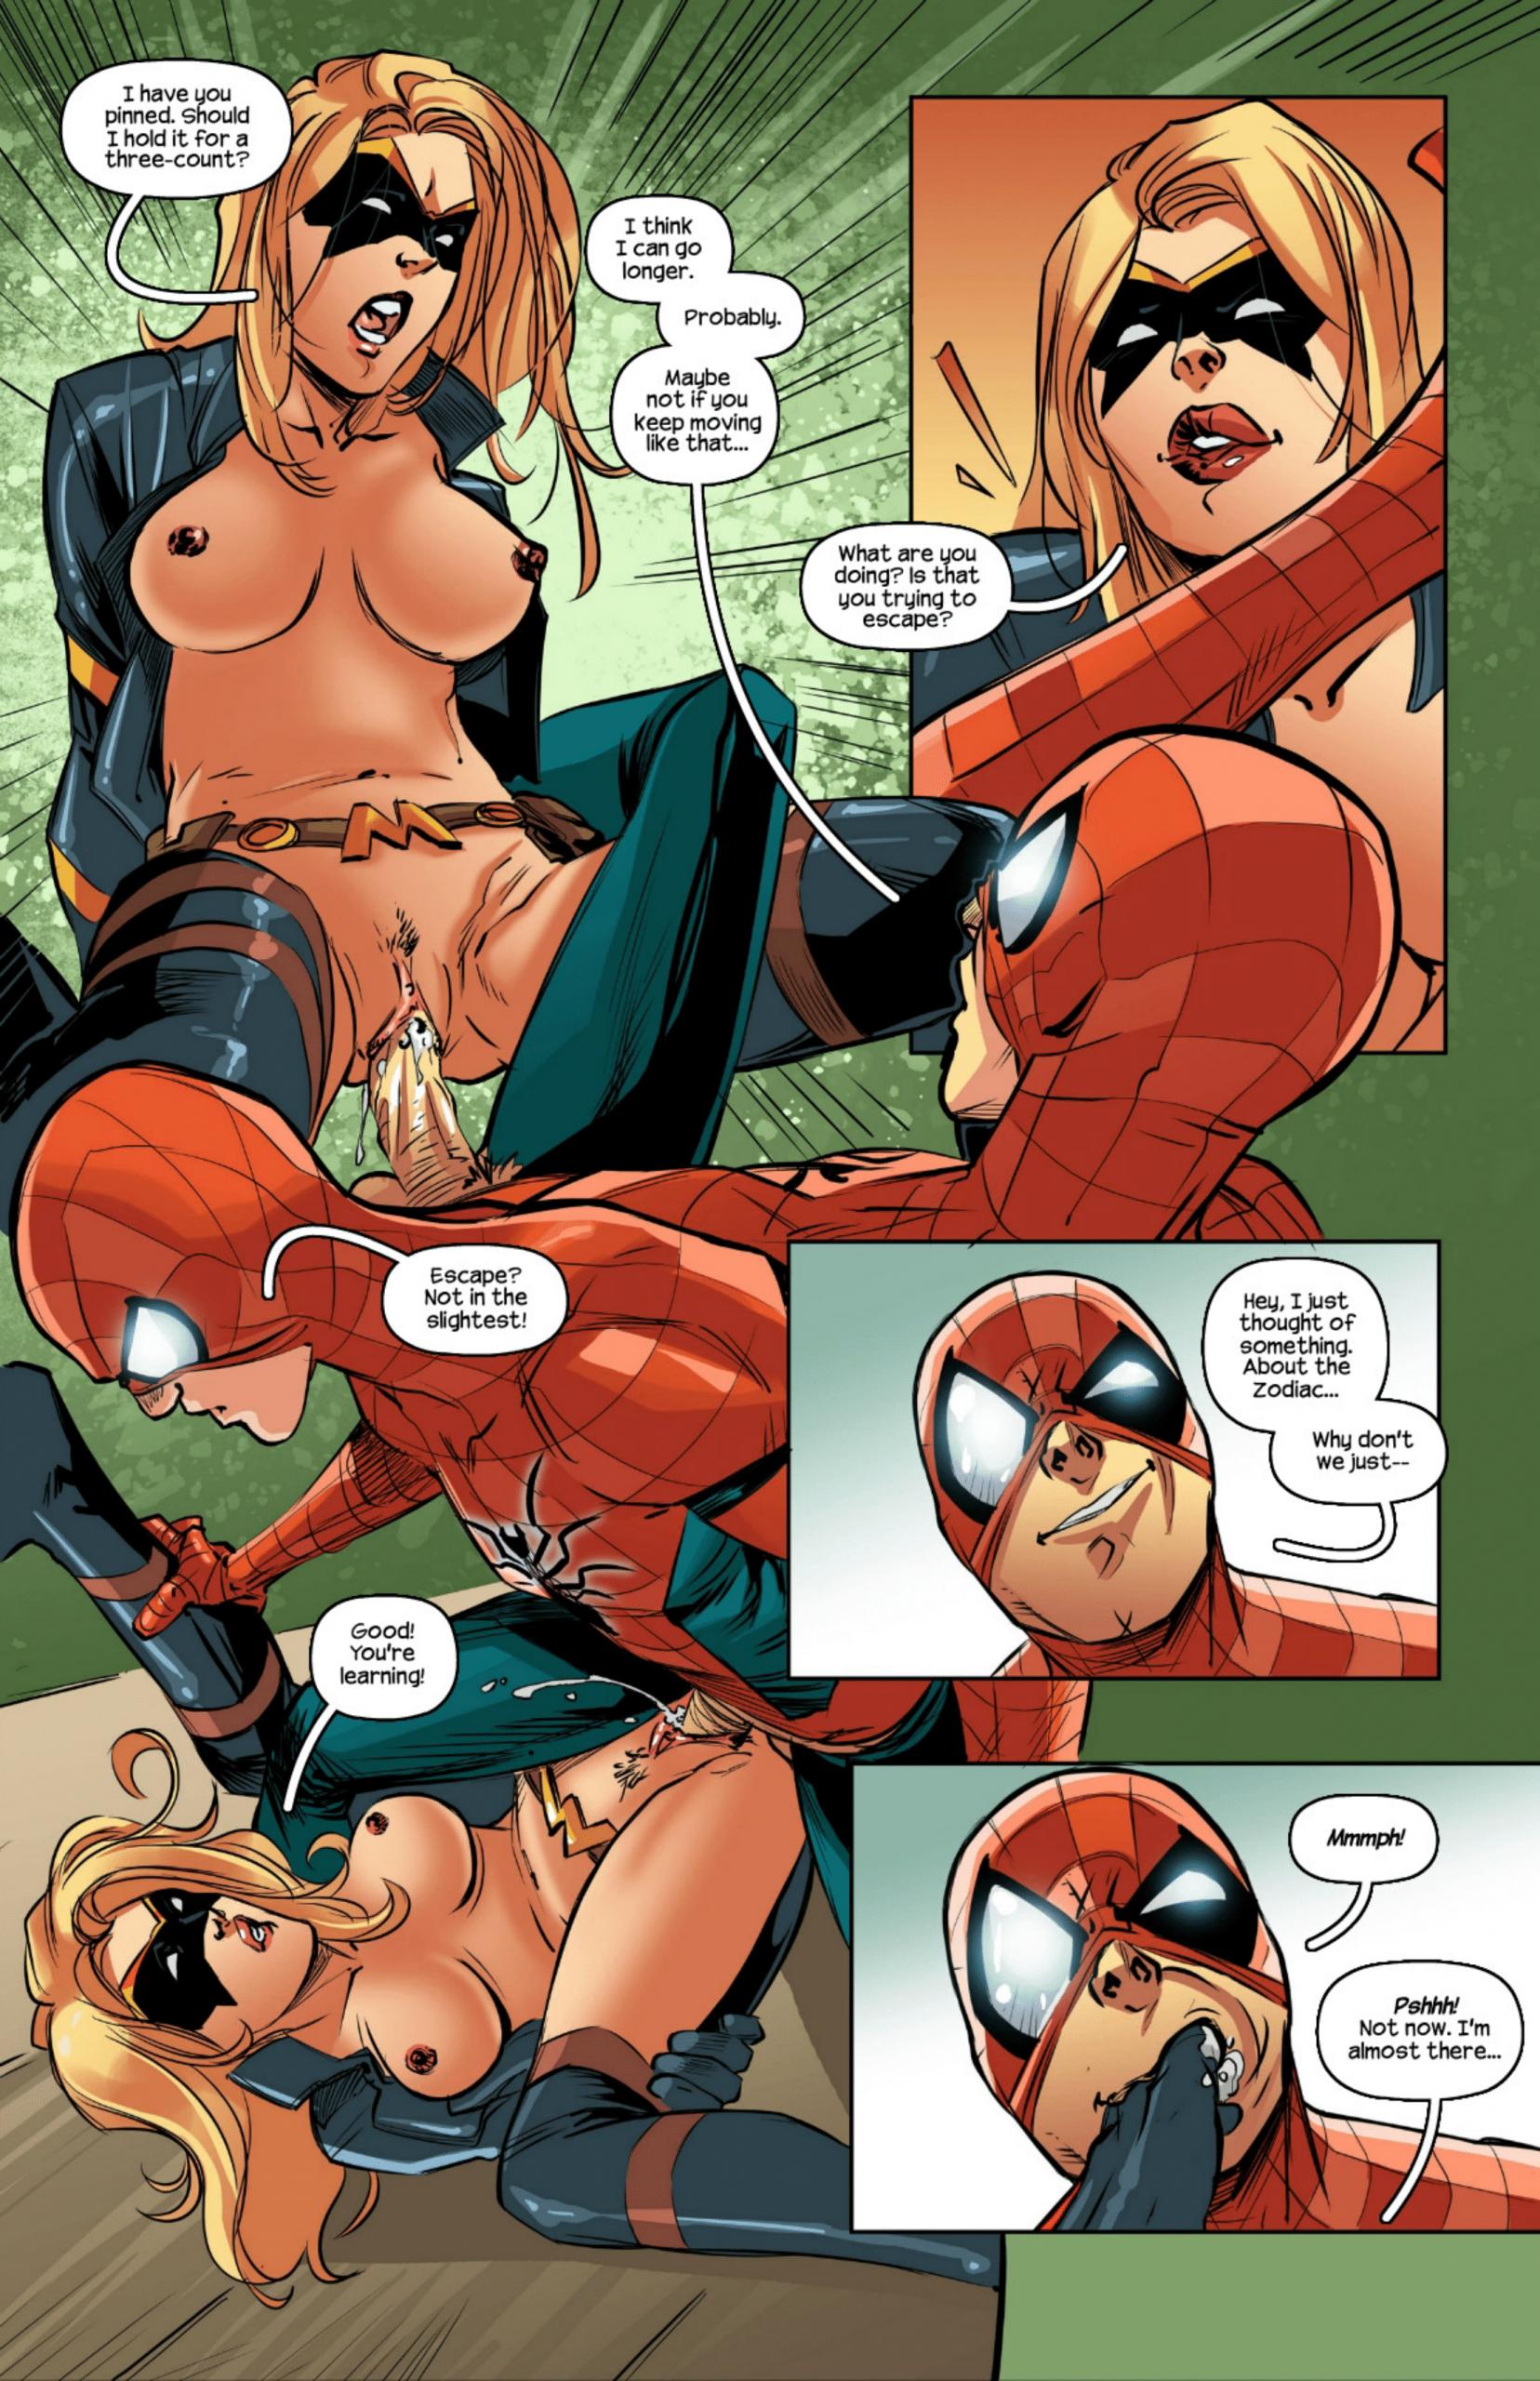 Bayushi - Mockingbird porn comics Anal Sex, Creampie, Cum Shots, Masturbation, Stockings, Straight